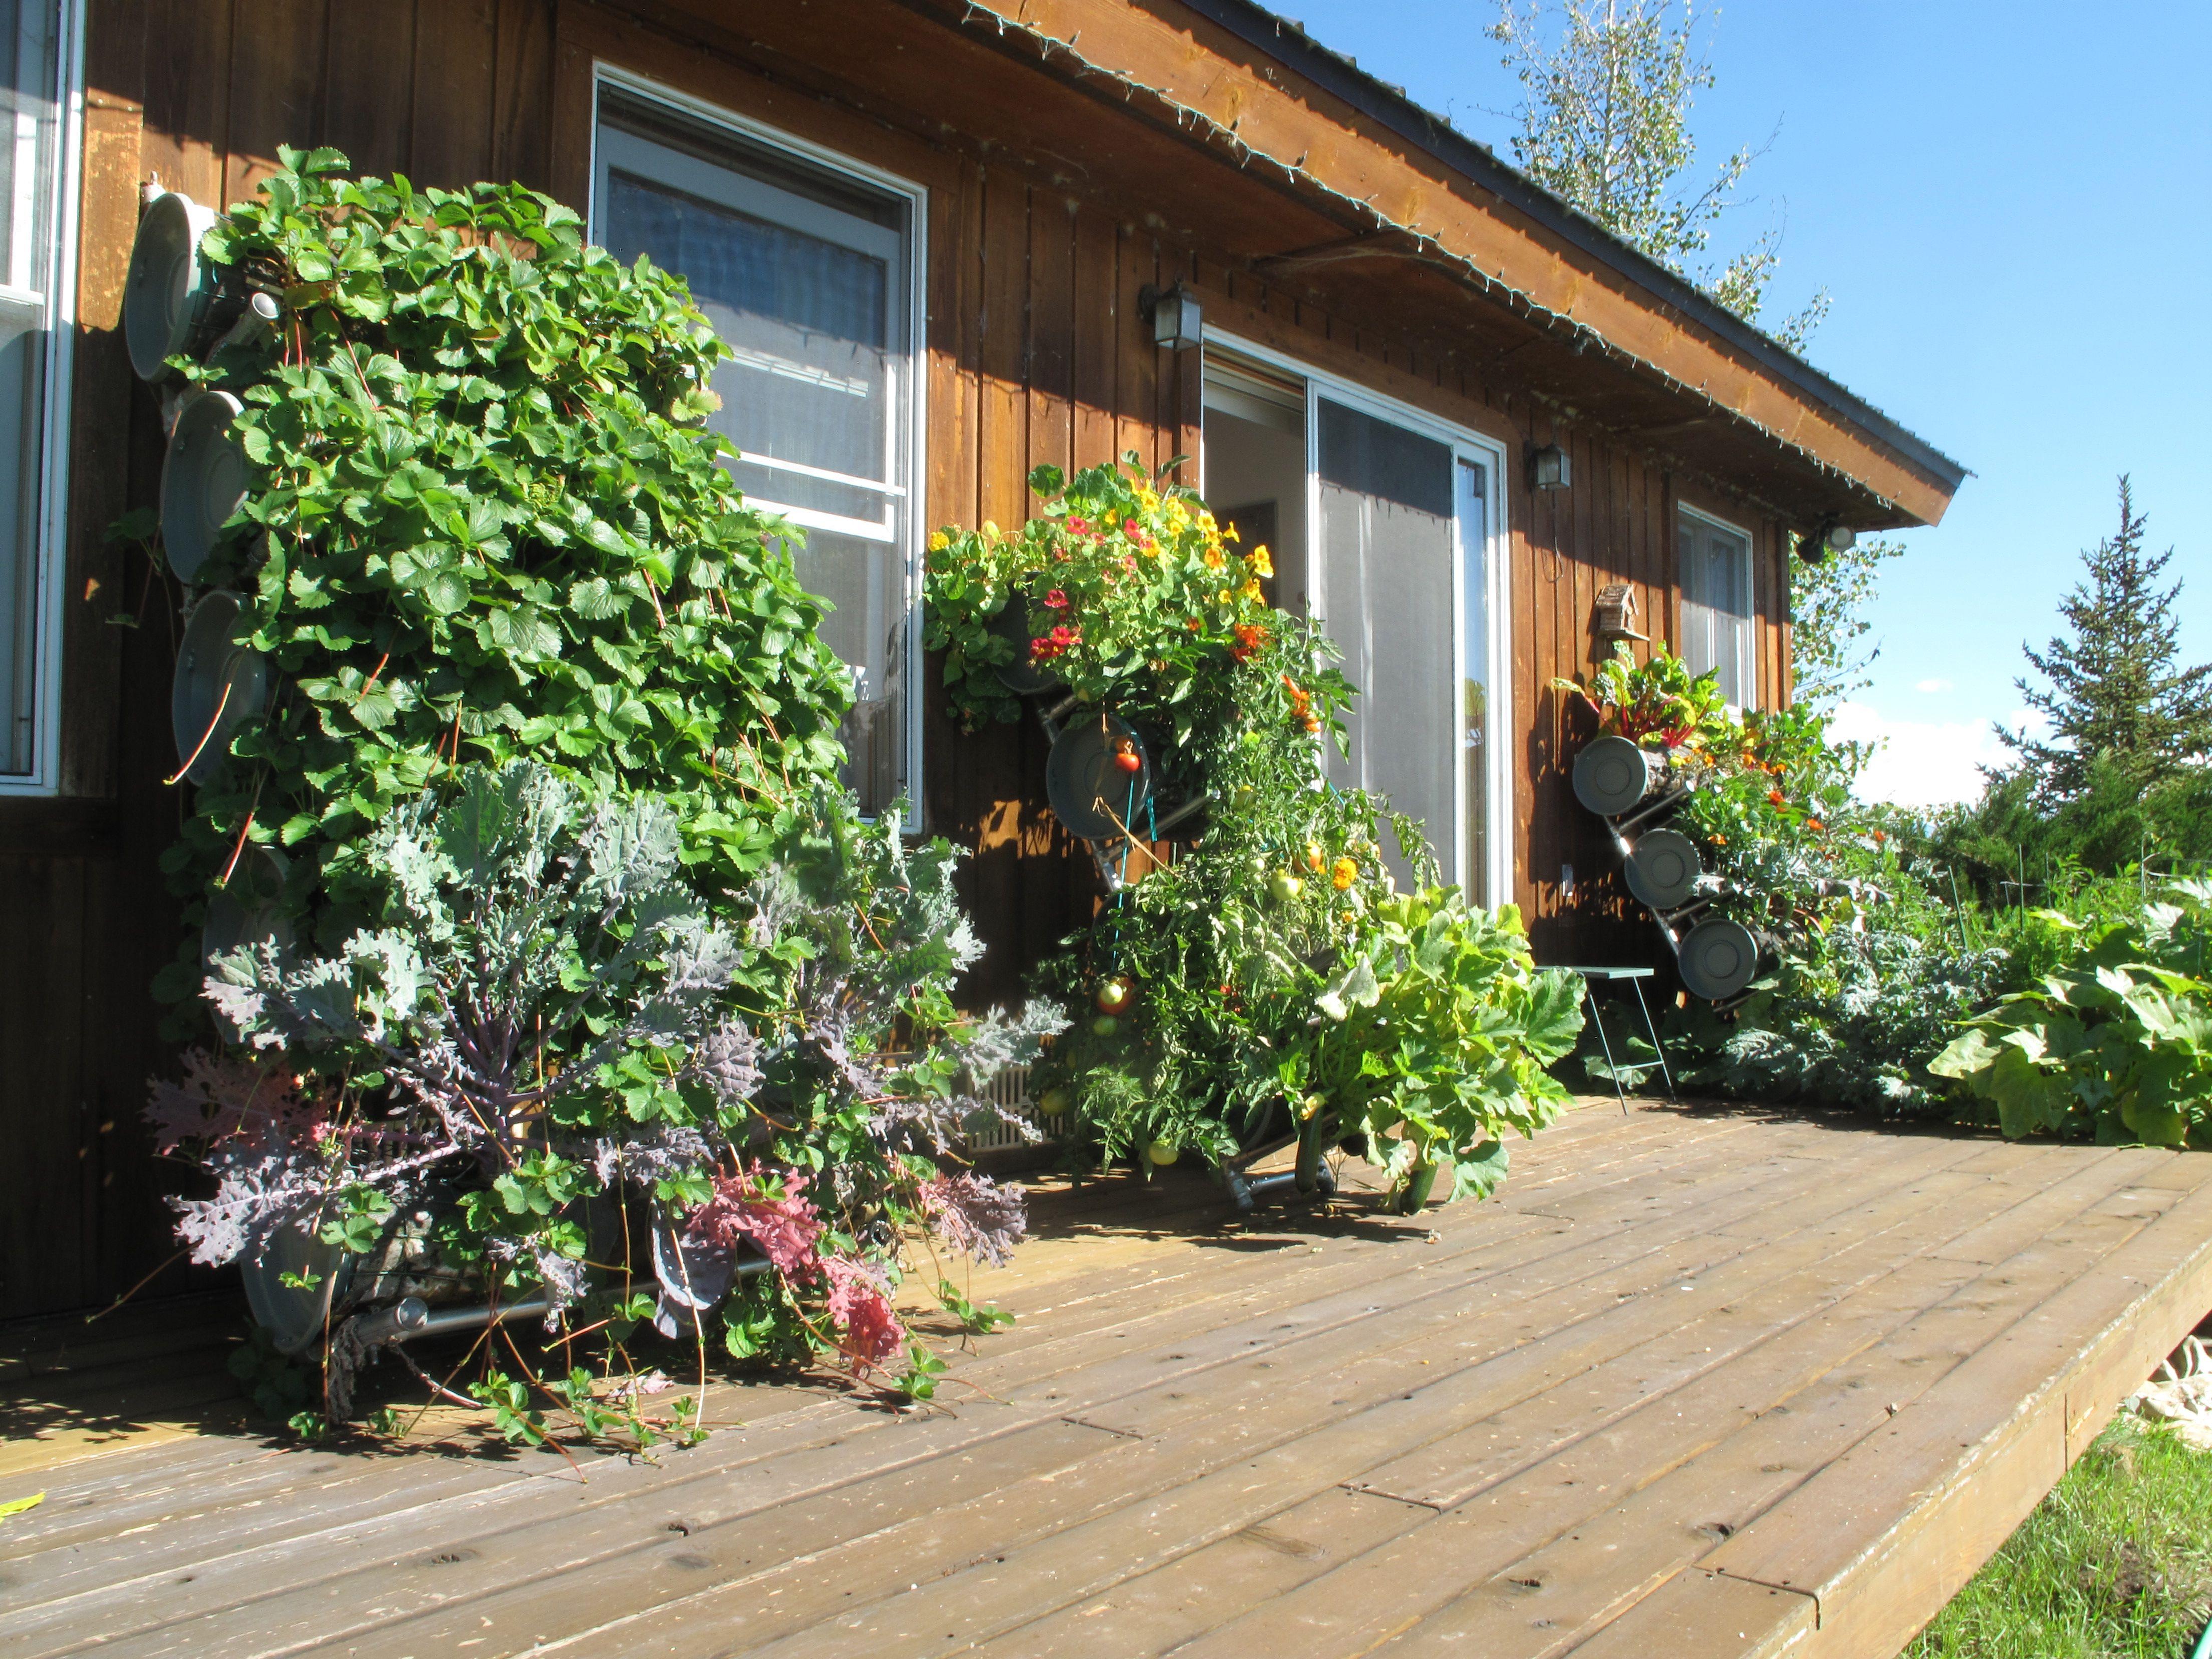 Balcony Budeze™ _ Botanical Bounty on a Budget, shows you ...